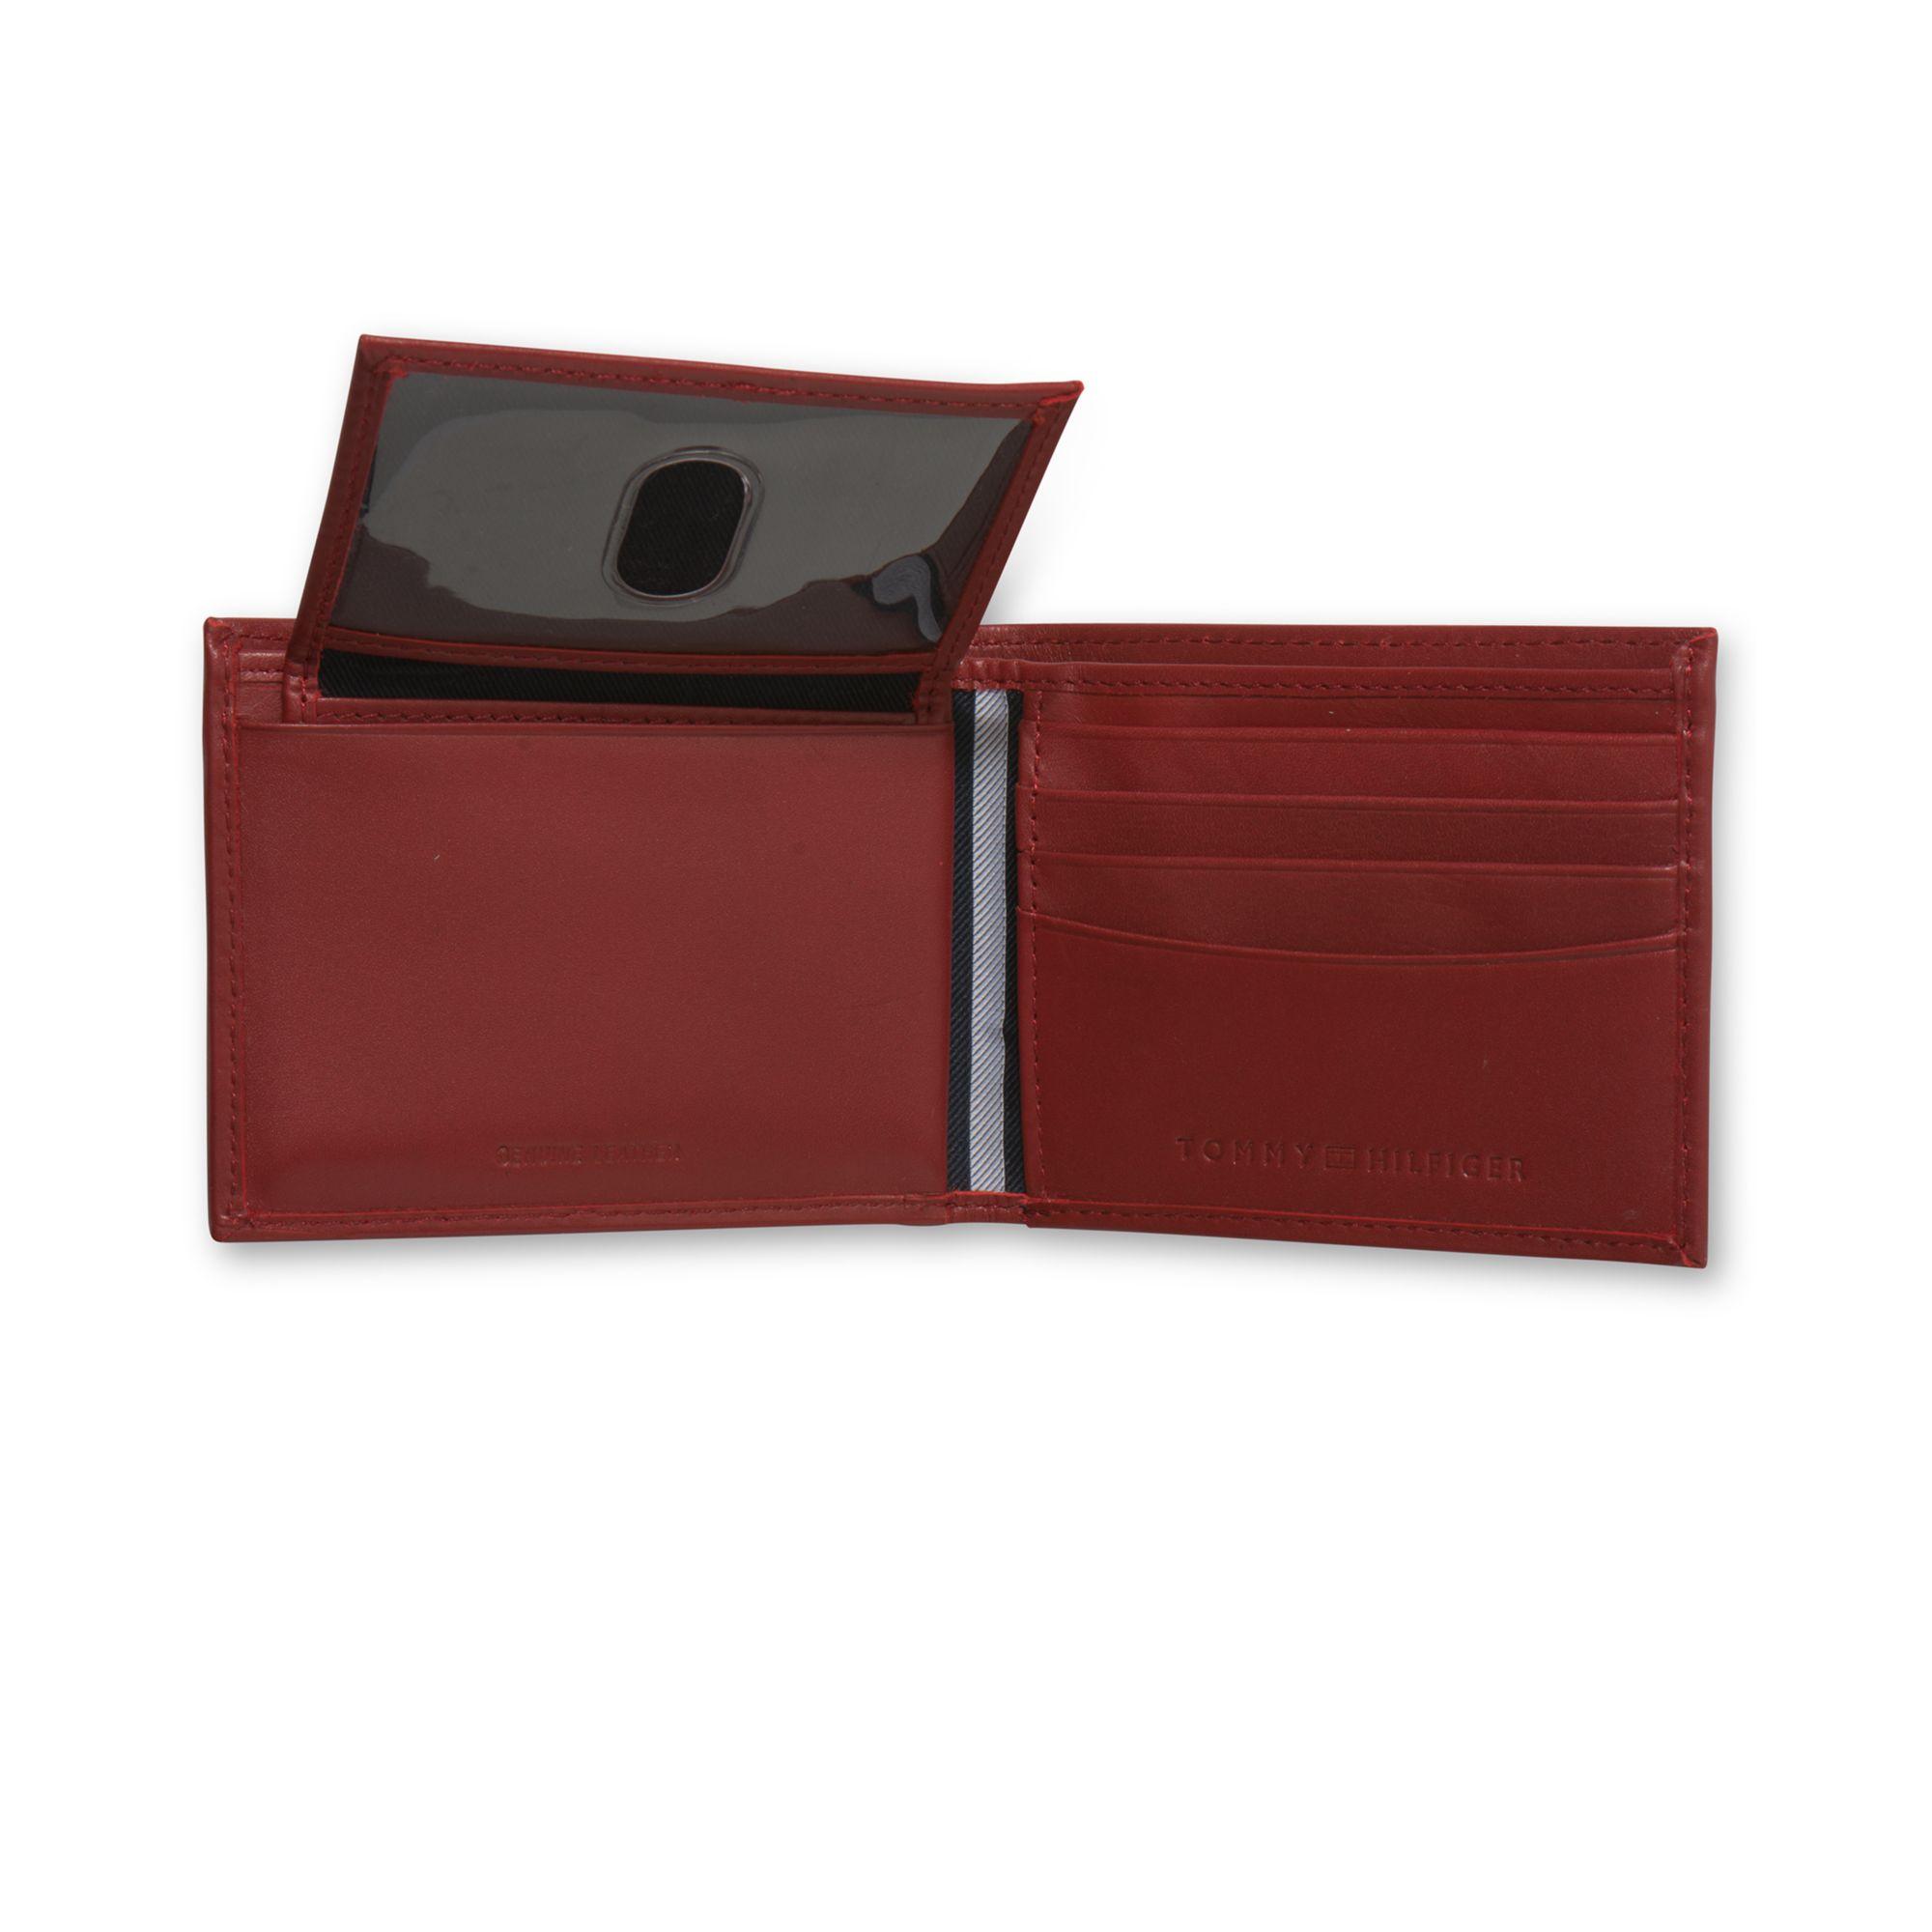 6aae25dbd1fc Tommy Hilfiger Red Dore Passcase Billfold Wallet for men